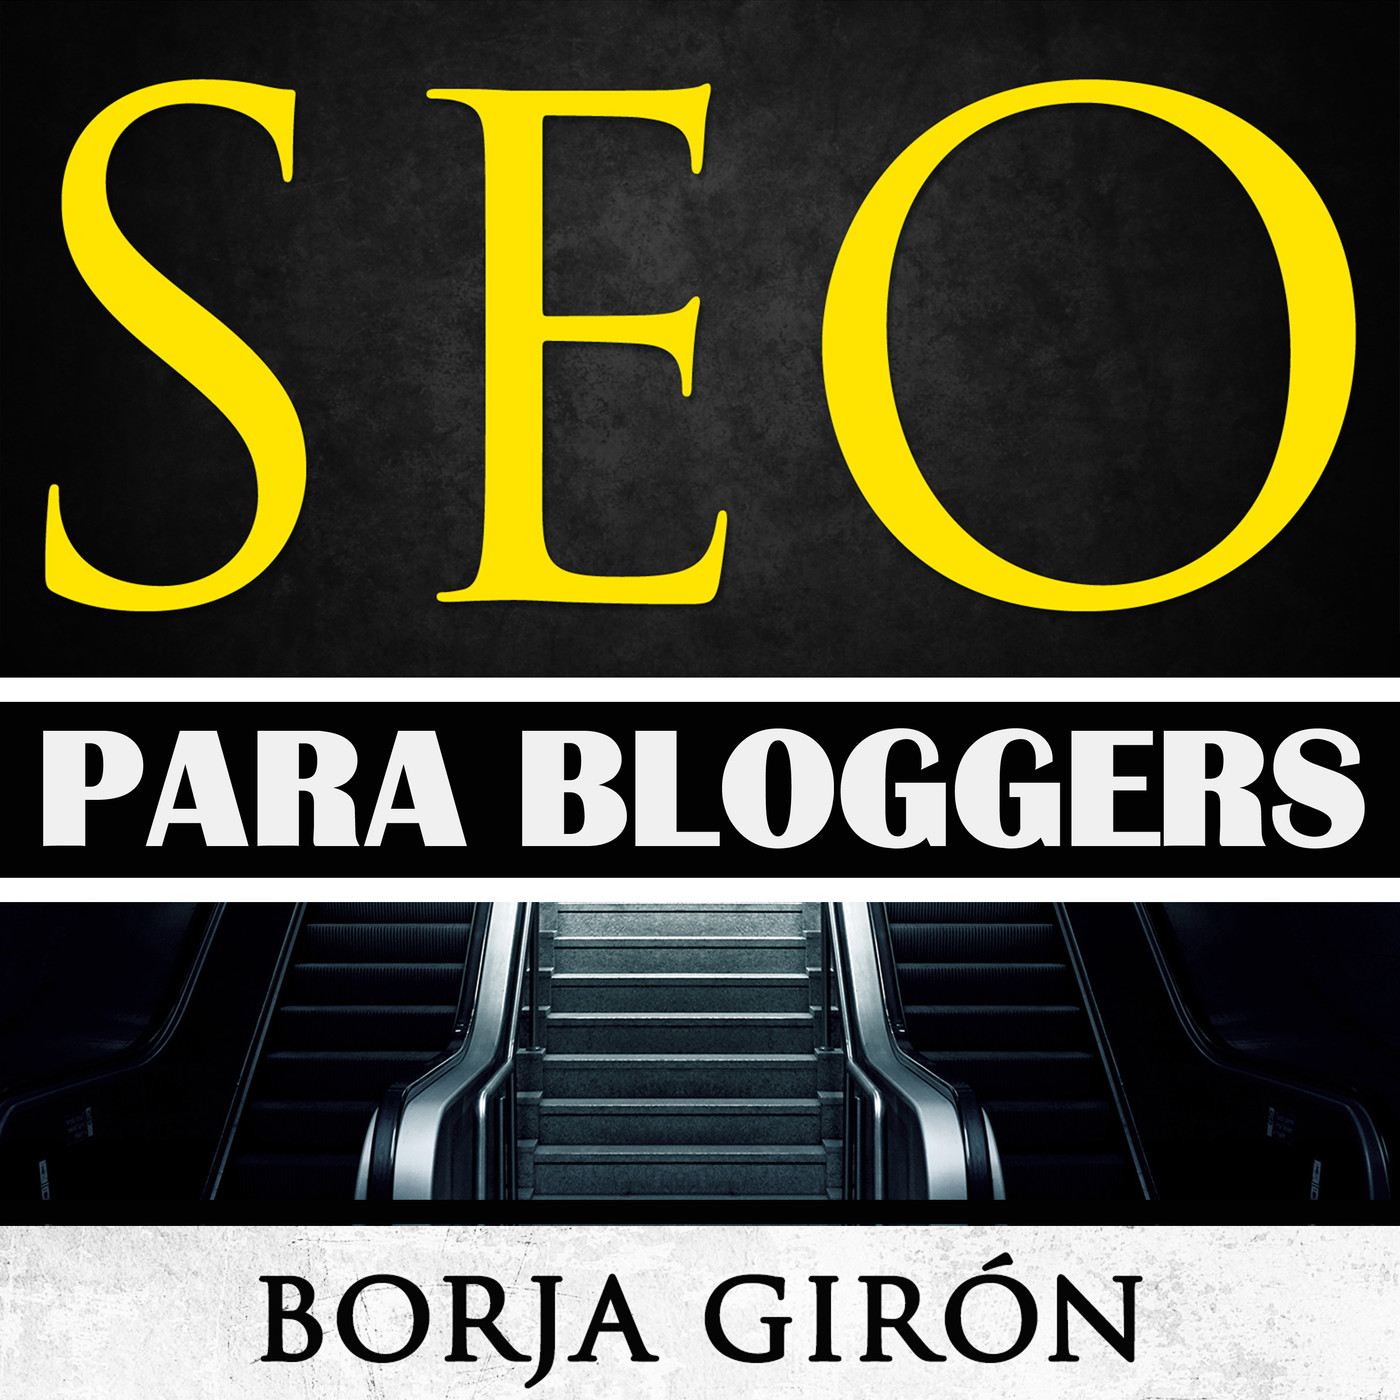 <![CDATA[SEO para bloggers]]>